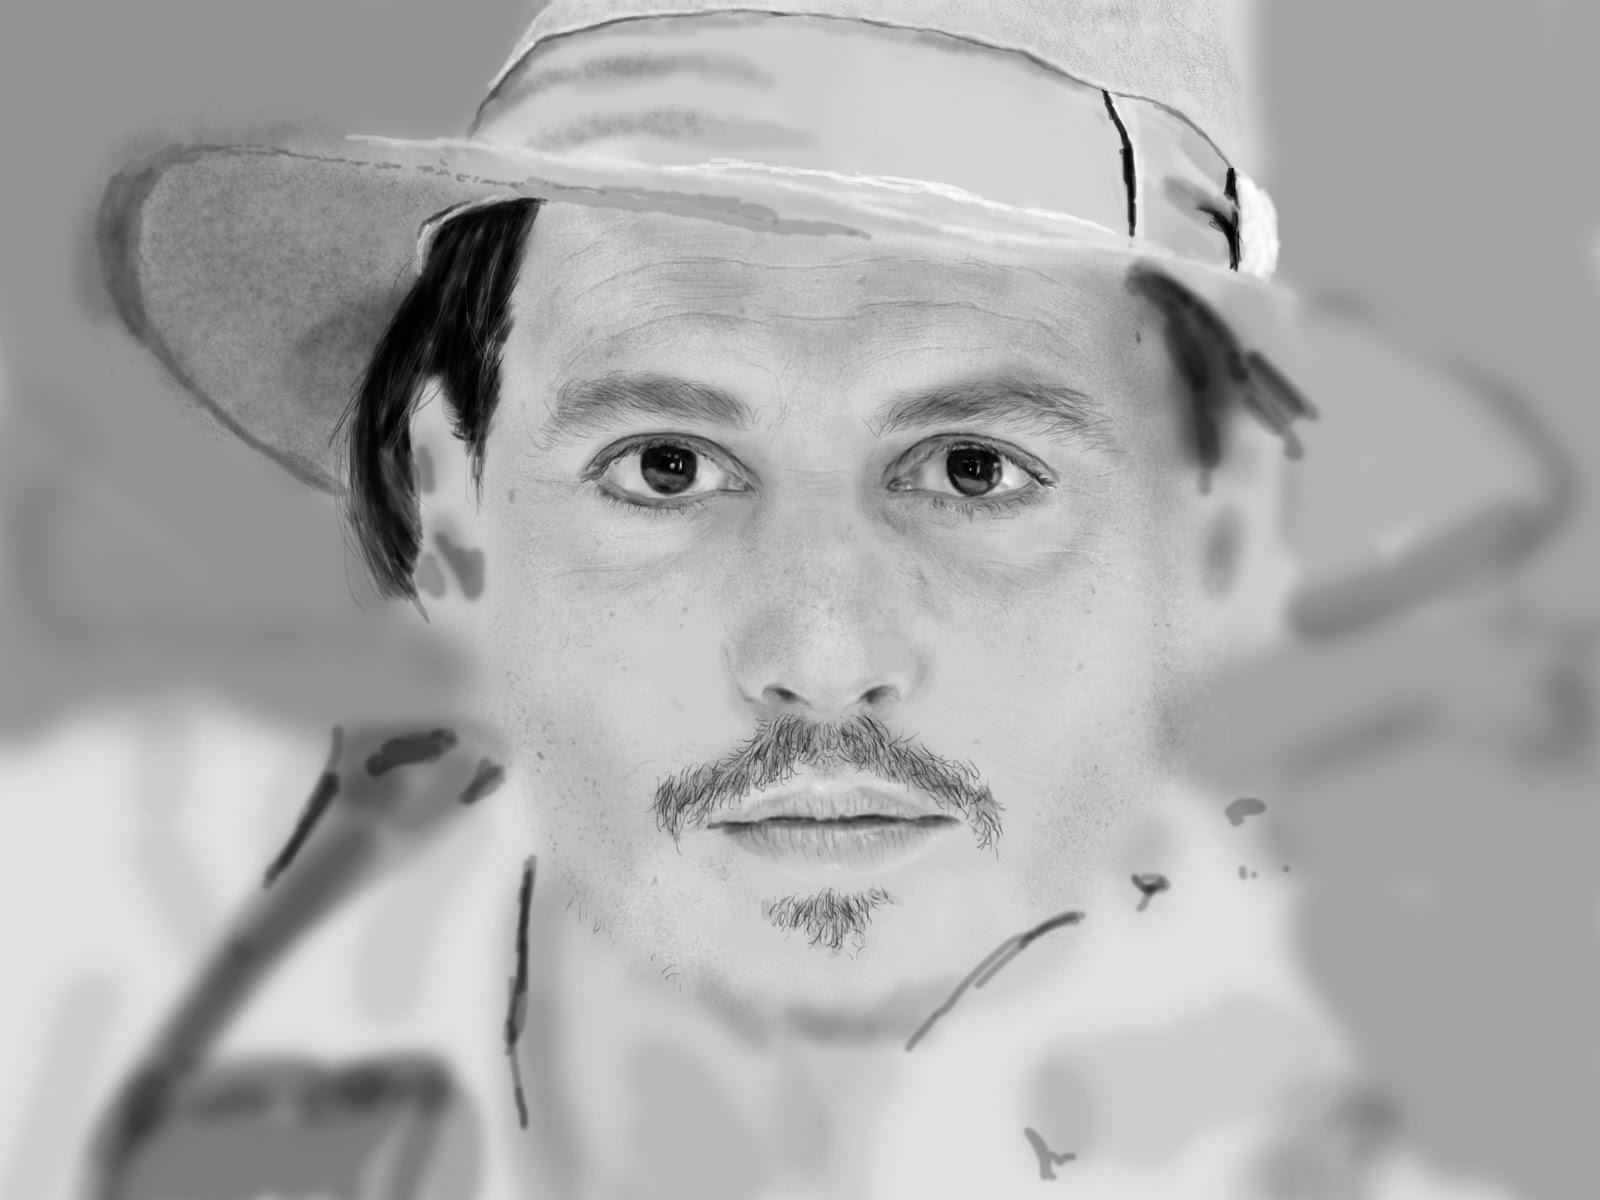 http://2.bp.blogspot.com/-F6G87kXB1Dg/TtV2bX_BVNI/AAAAAAAAAFw/3P_g9GtkVGc/s1600/Johnny+Depp+so+far+9+4%252C5+h.jpg